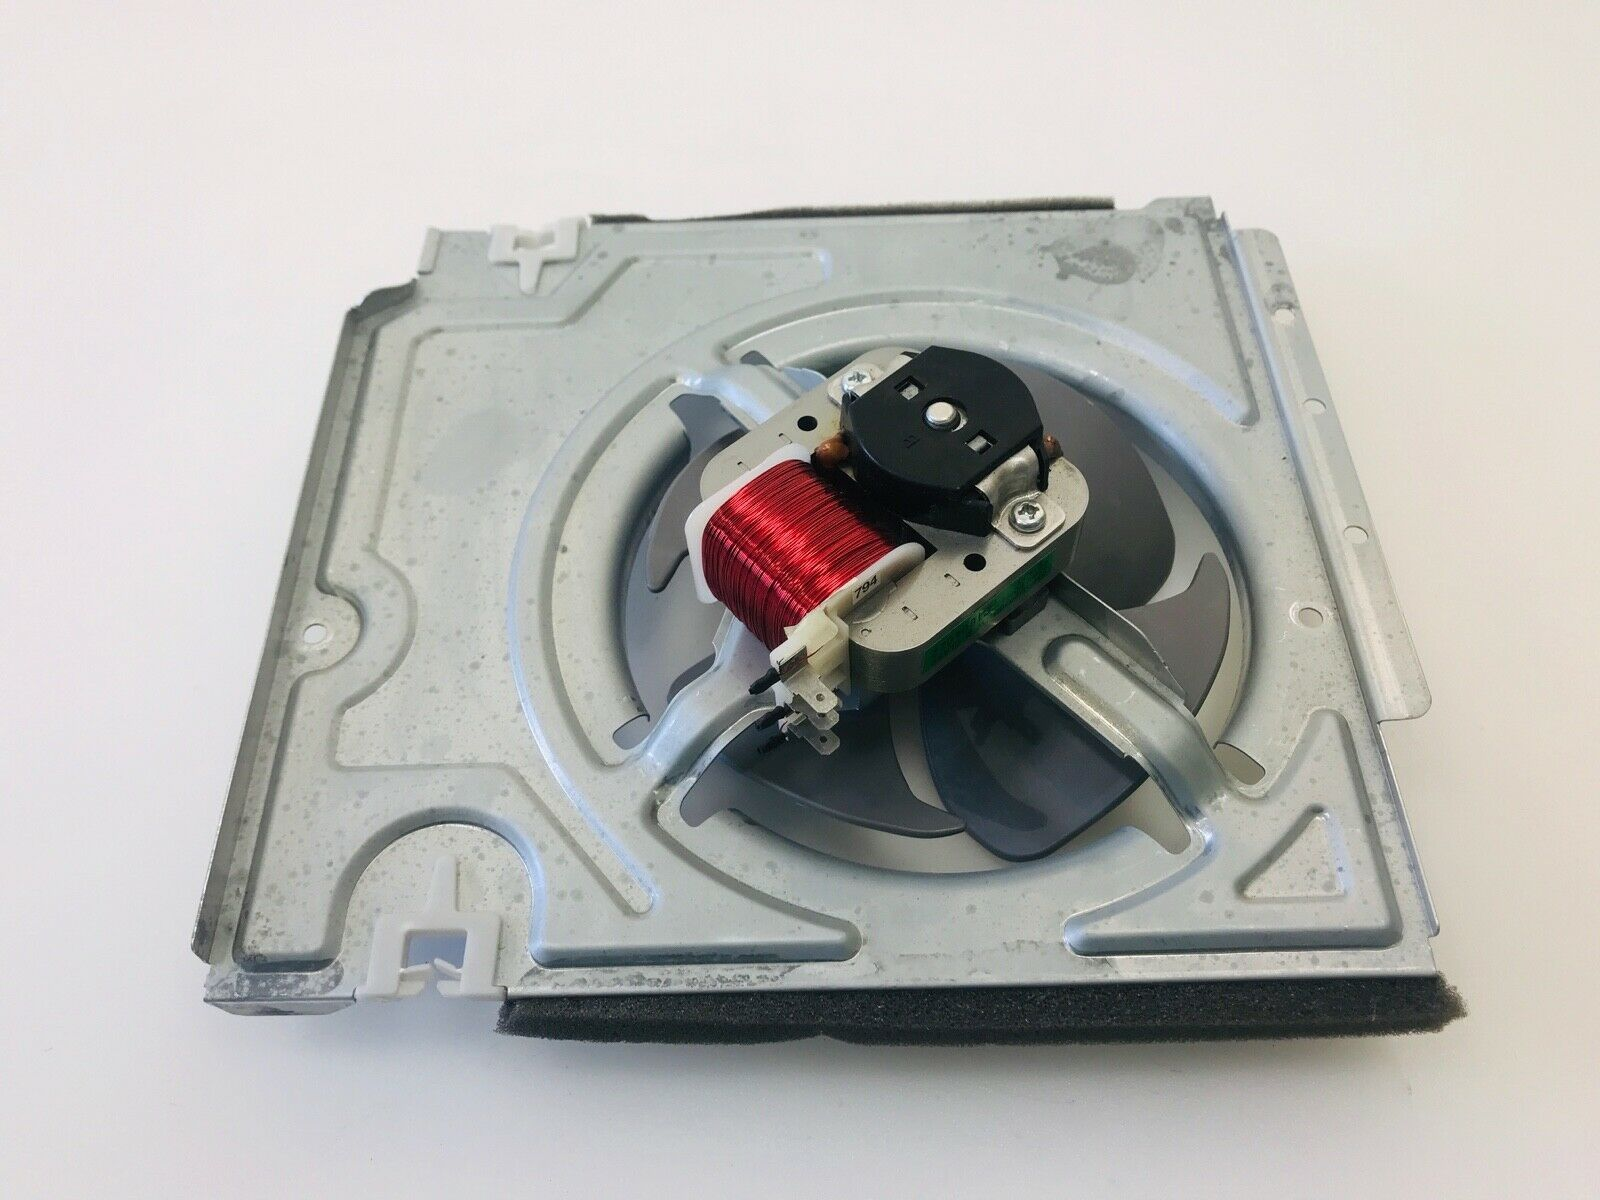 Samsung Microwave Cooling Fan Motor w/Blade & Housing DE31-00045B DE31-00064A image 4